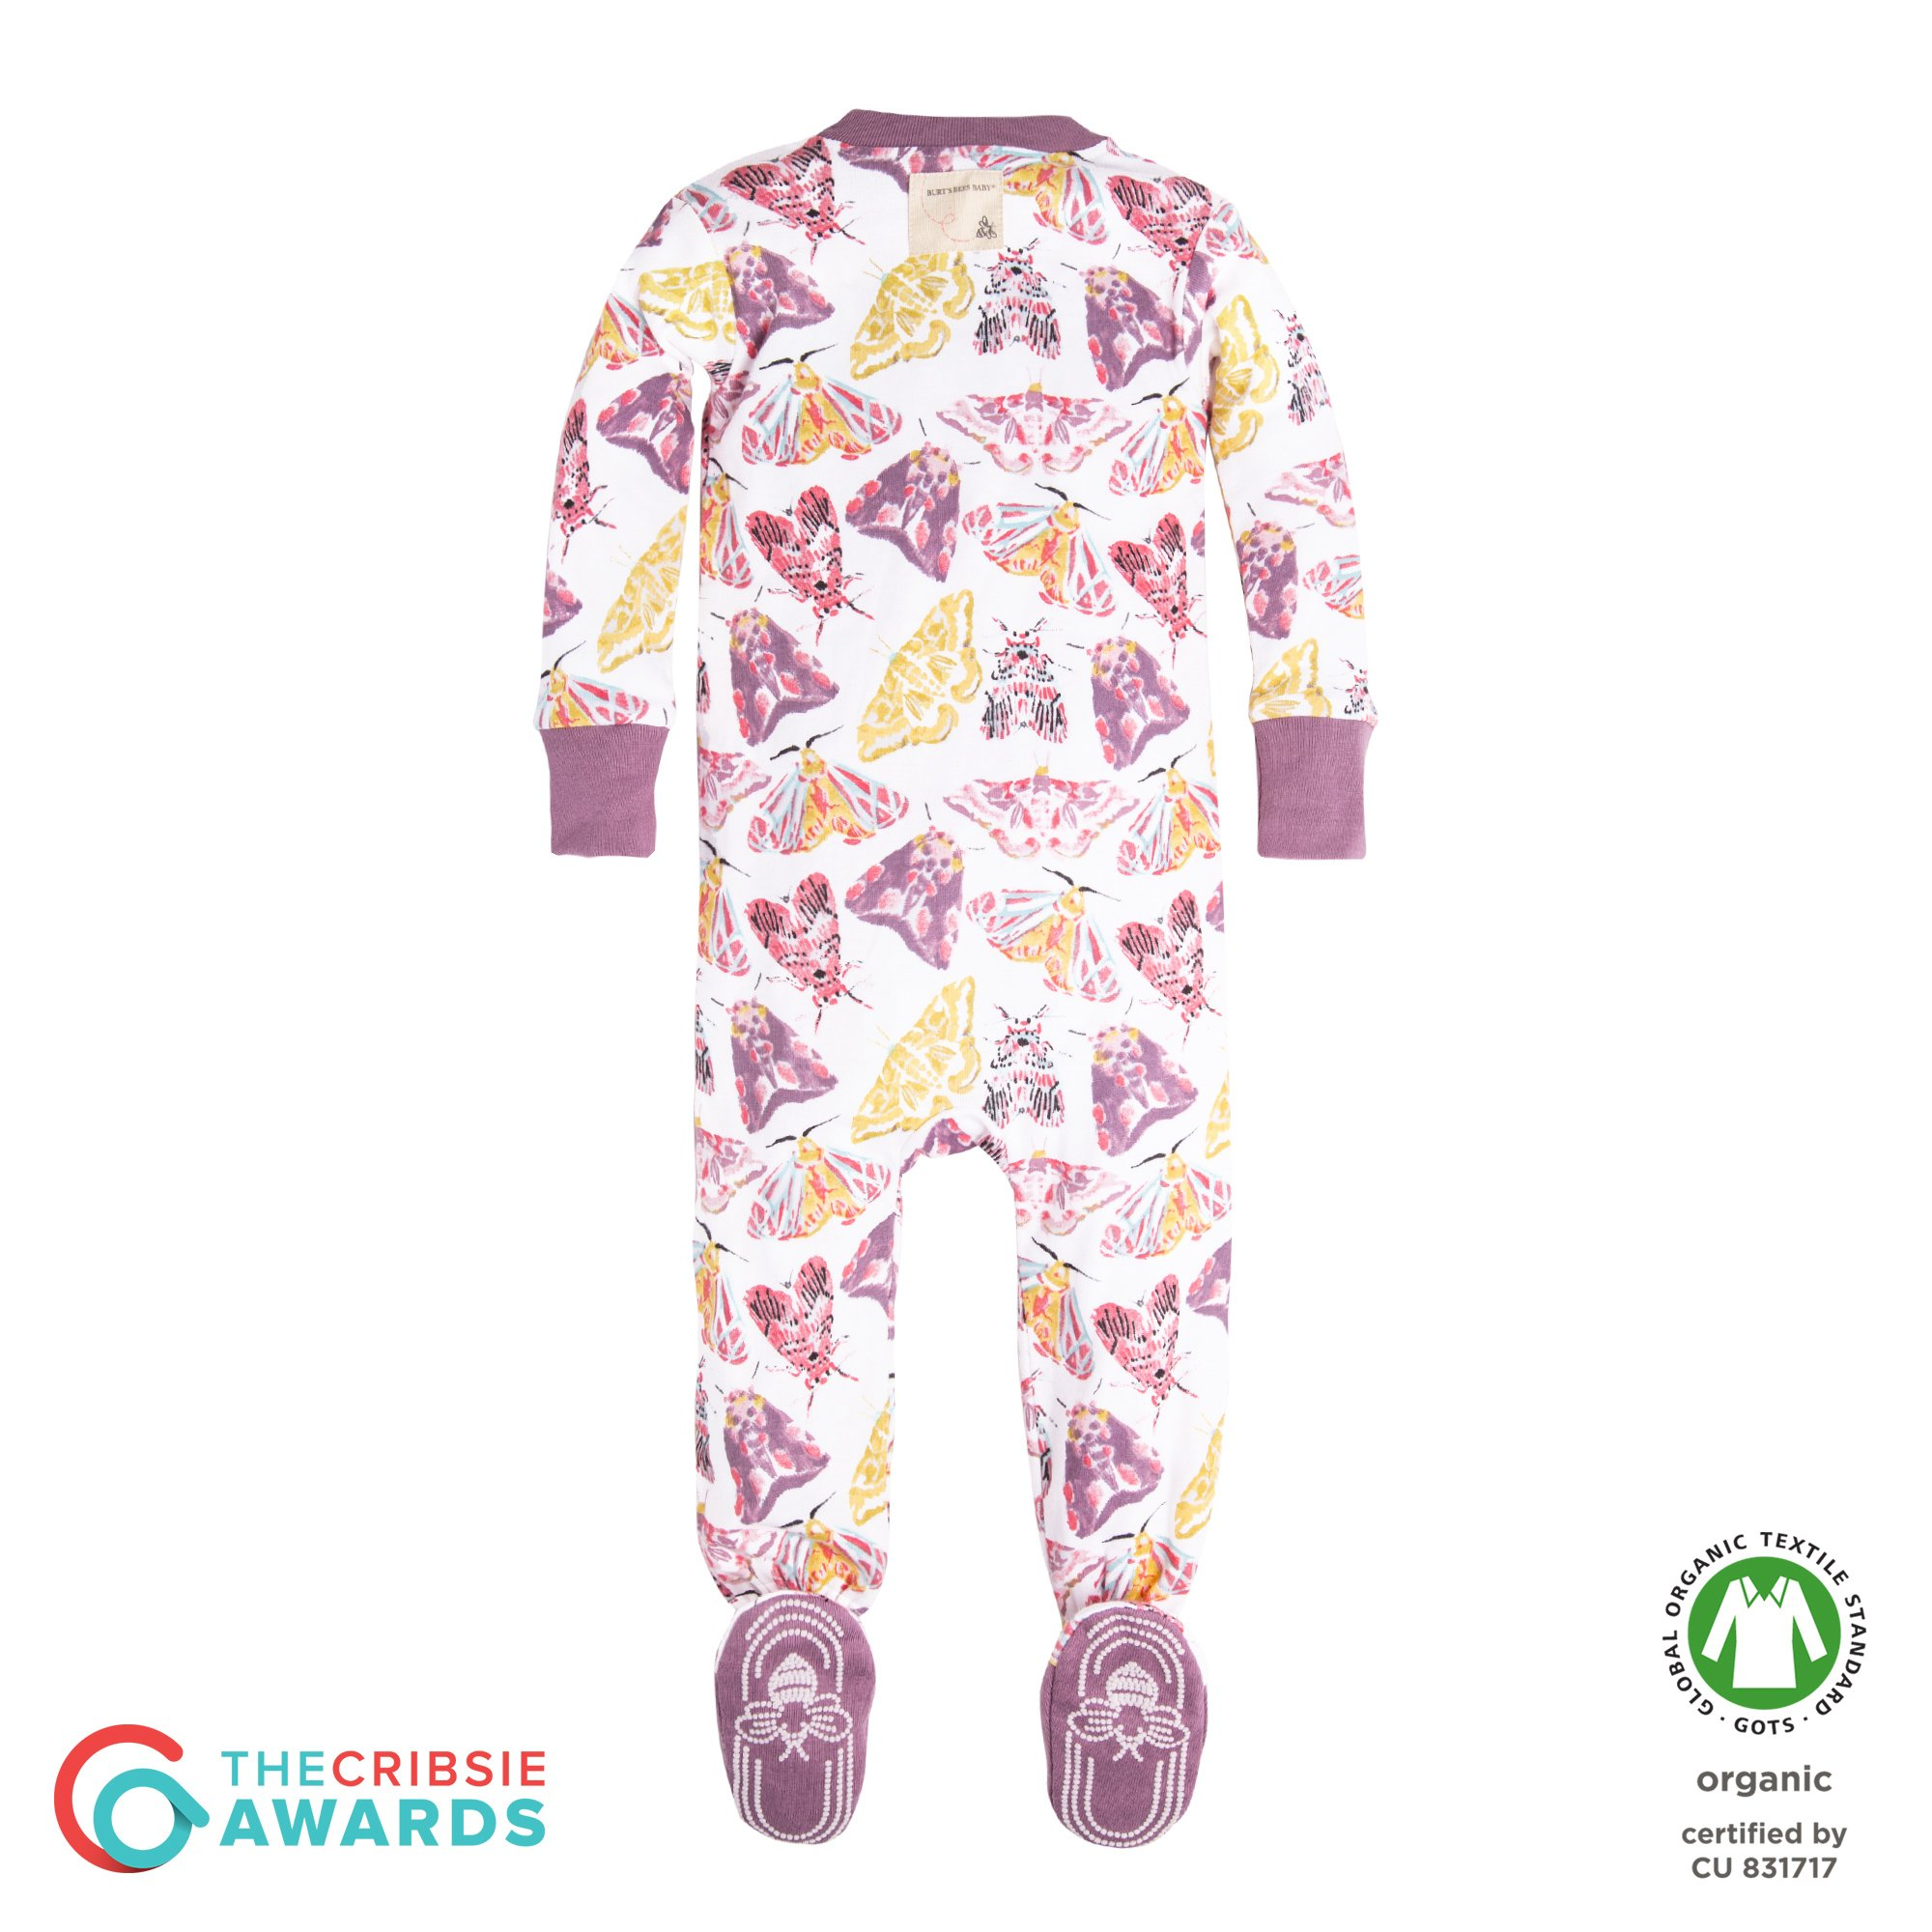 97f47b38e4 Burt s Bees Baby Baby Girls  Organic Floral Zip Front Non-Slip Footed  Sleeper Pajamas